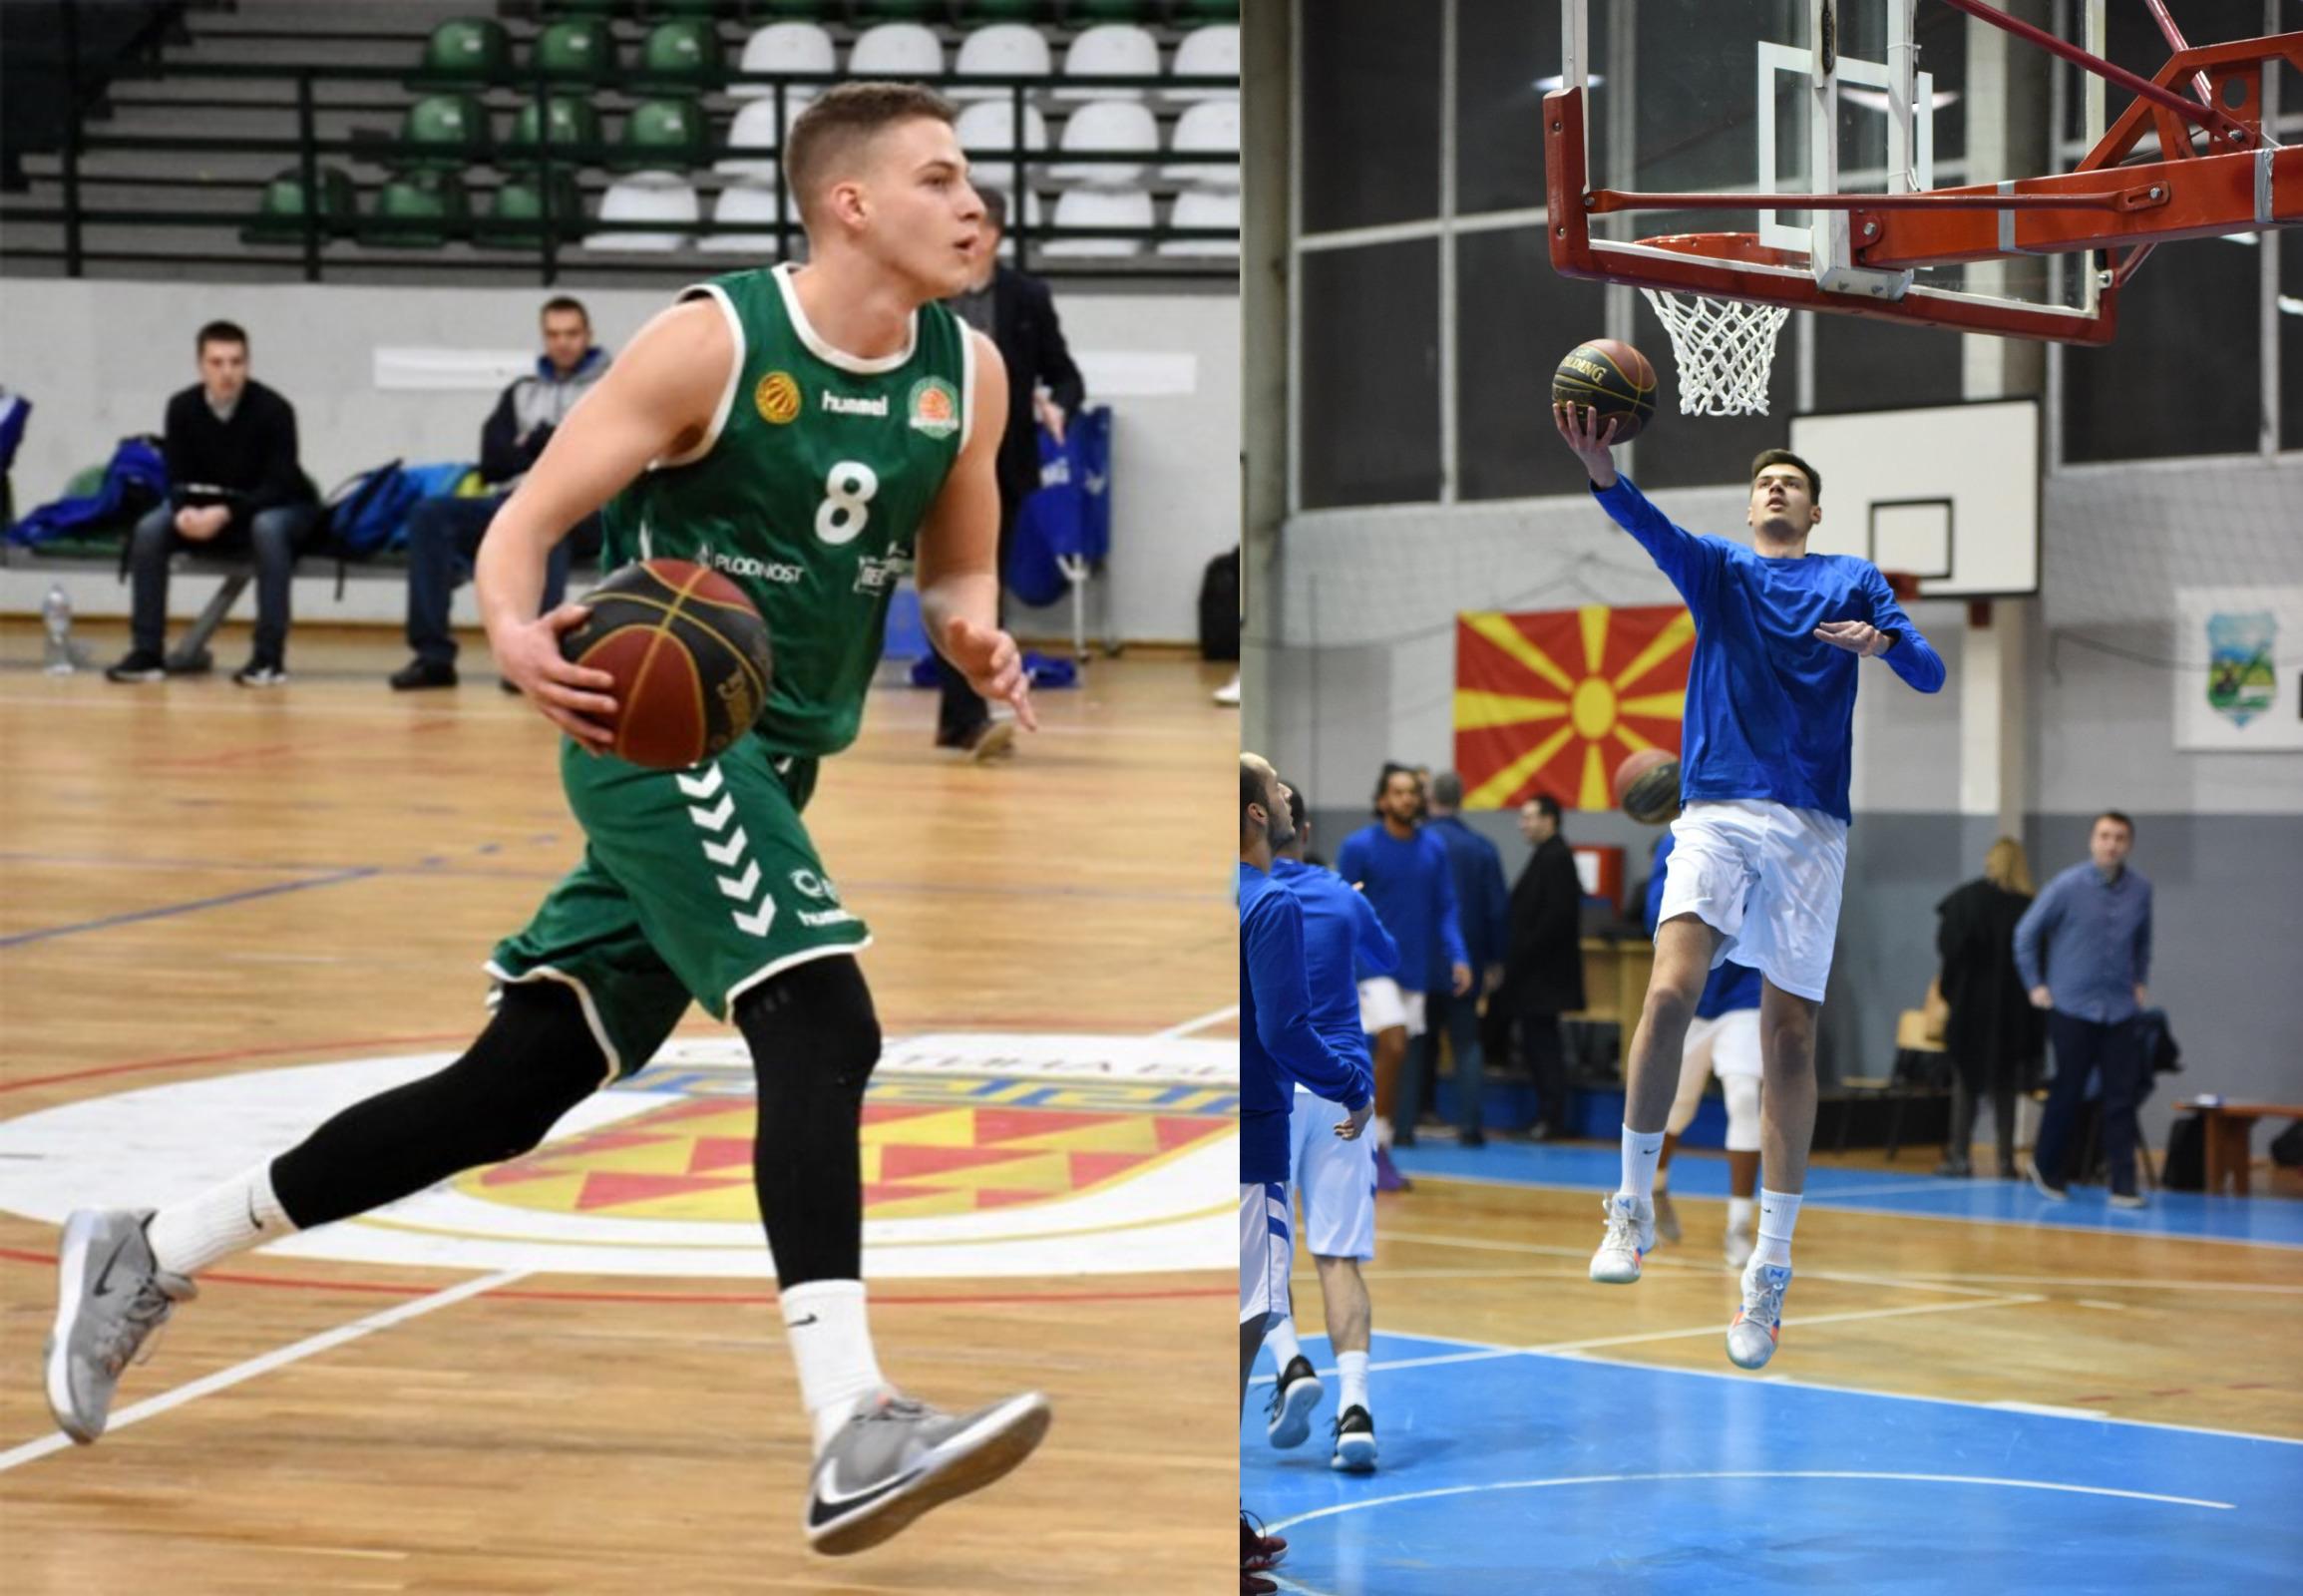 Обедниковски нов играч, продолжува и Анастасовски